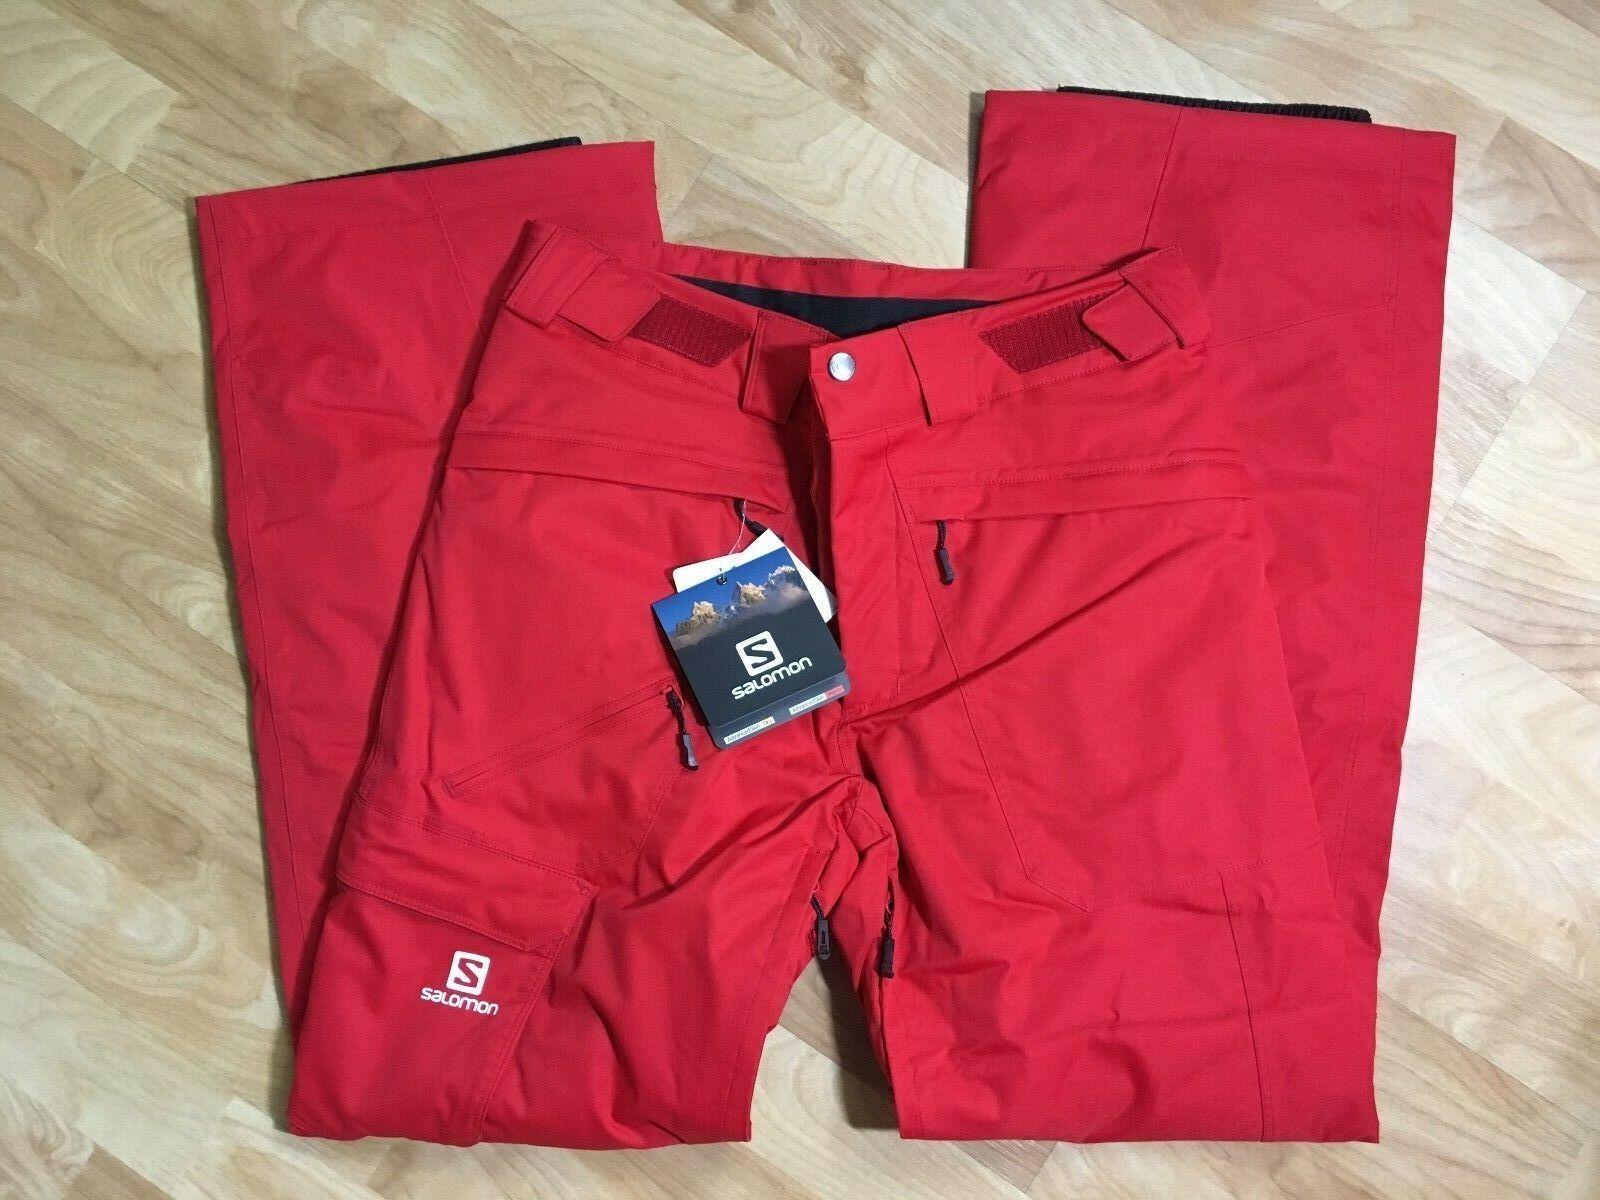 Salomon Response Ski Snowboard Pants Unisex, Size XS or S, Red, NEW